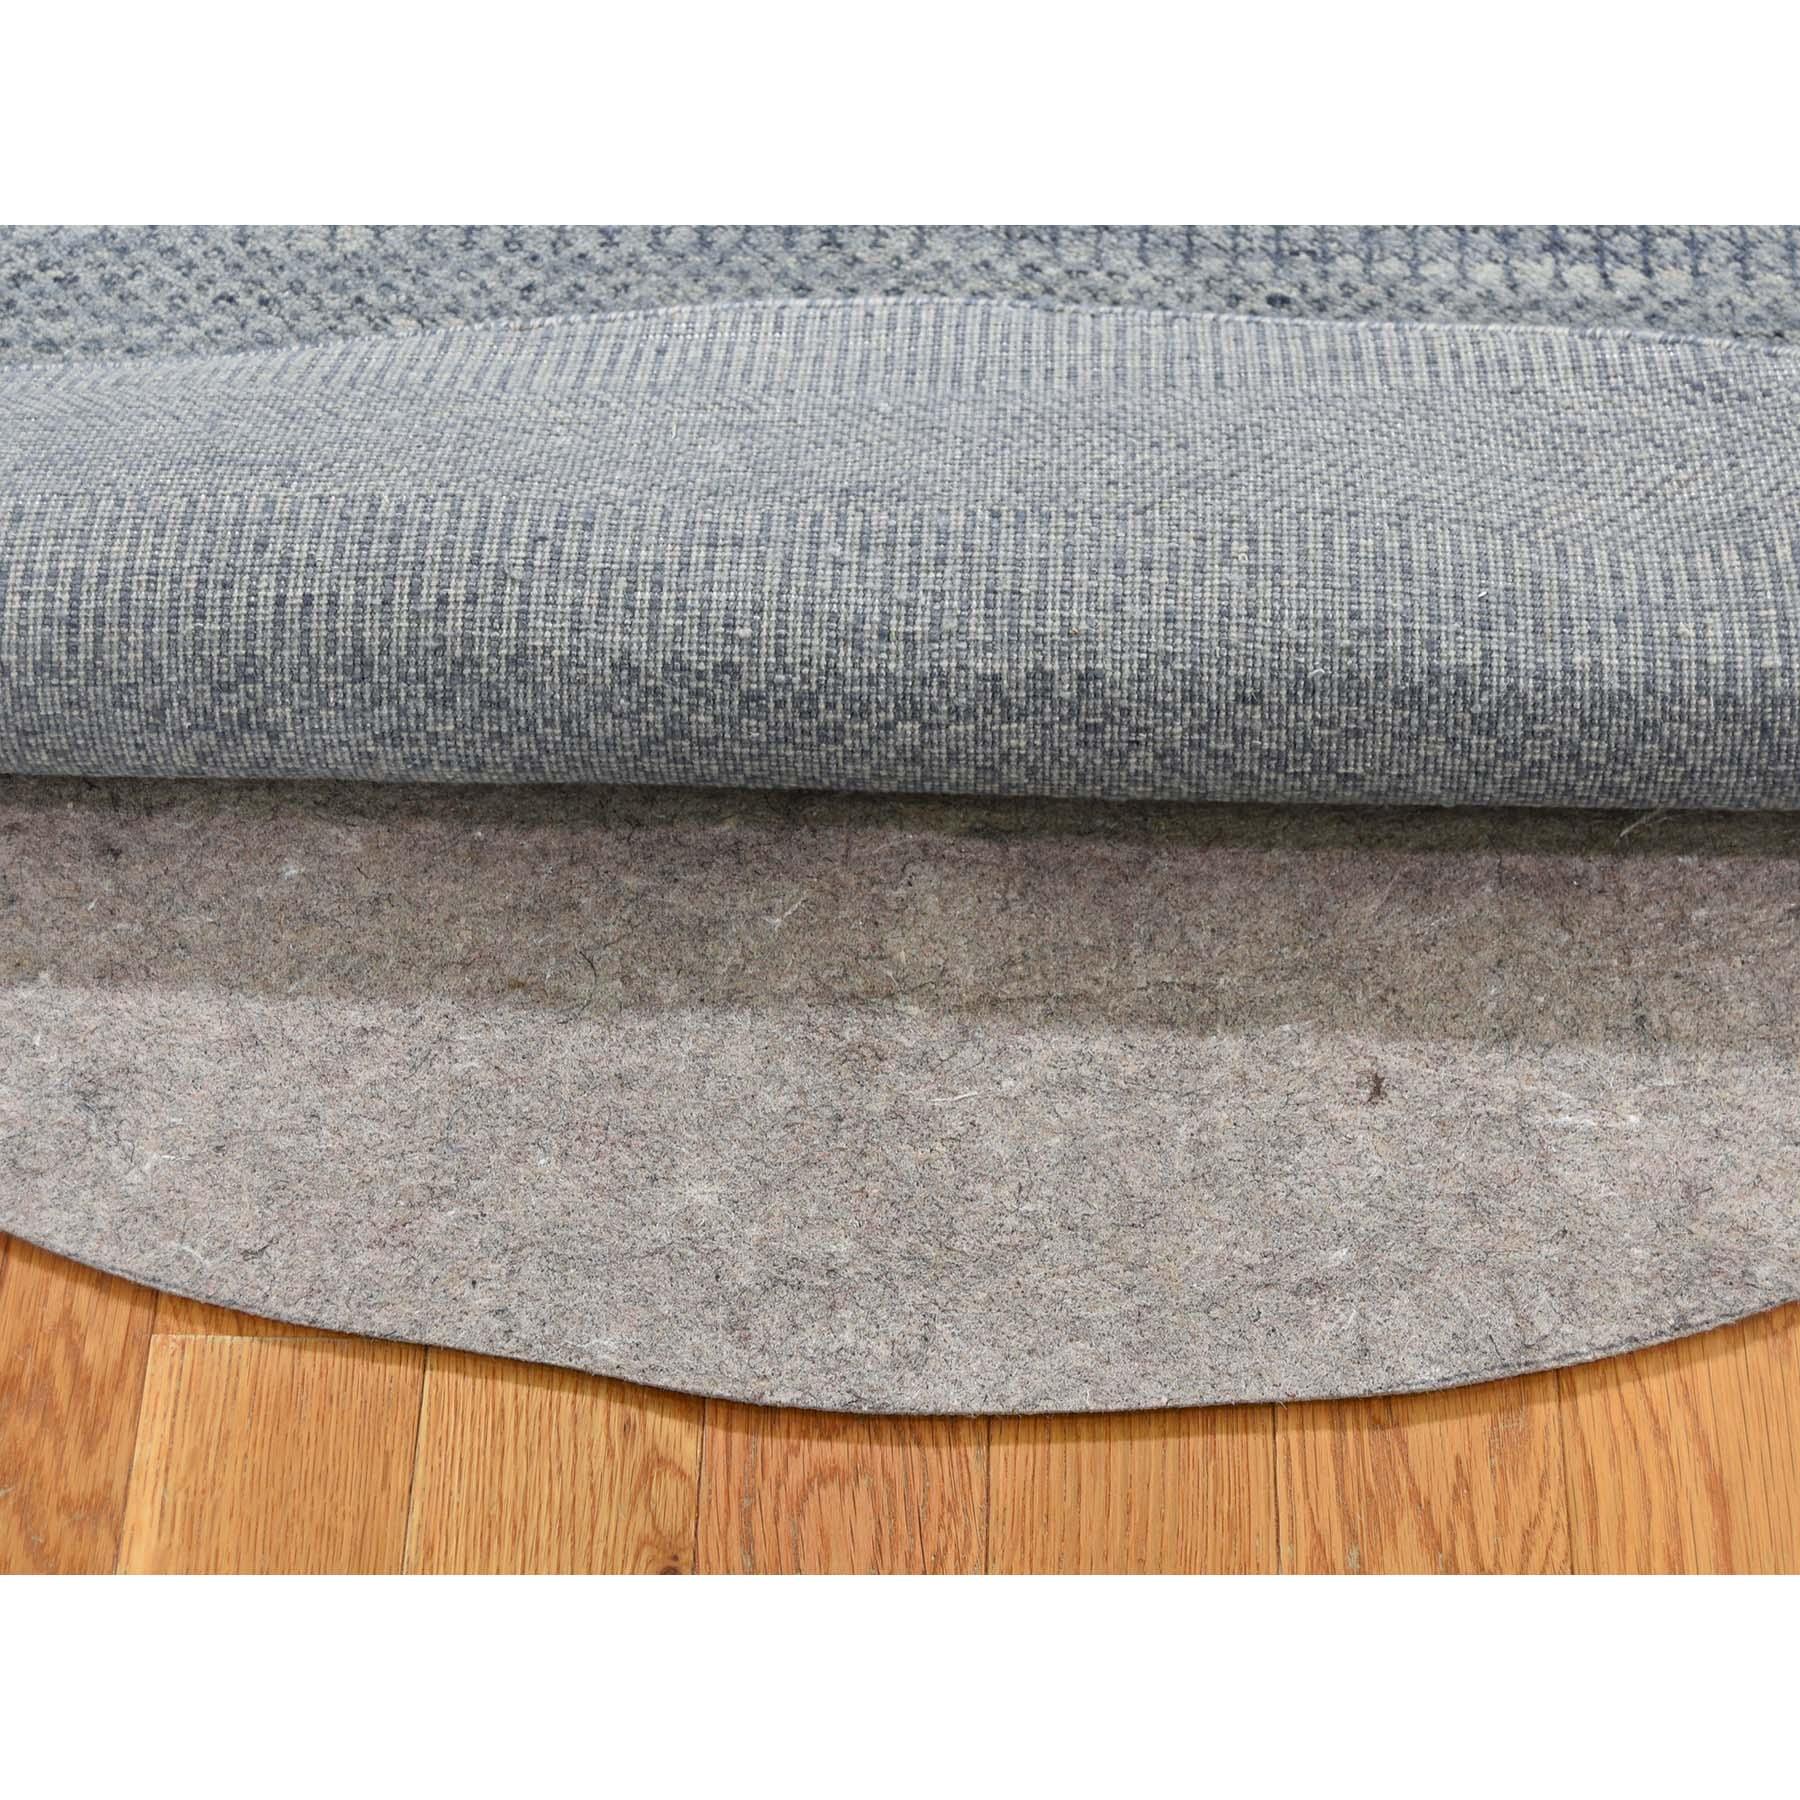 5-10 x5-10  Round Wool and Silk Grass Design Hand-Knotted Oriental Rug